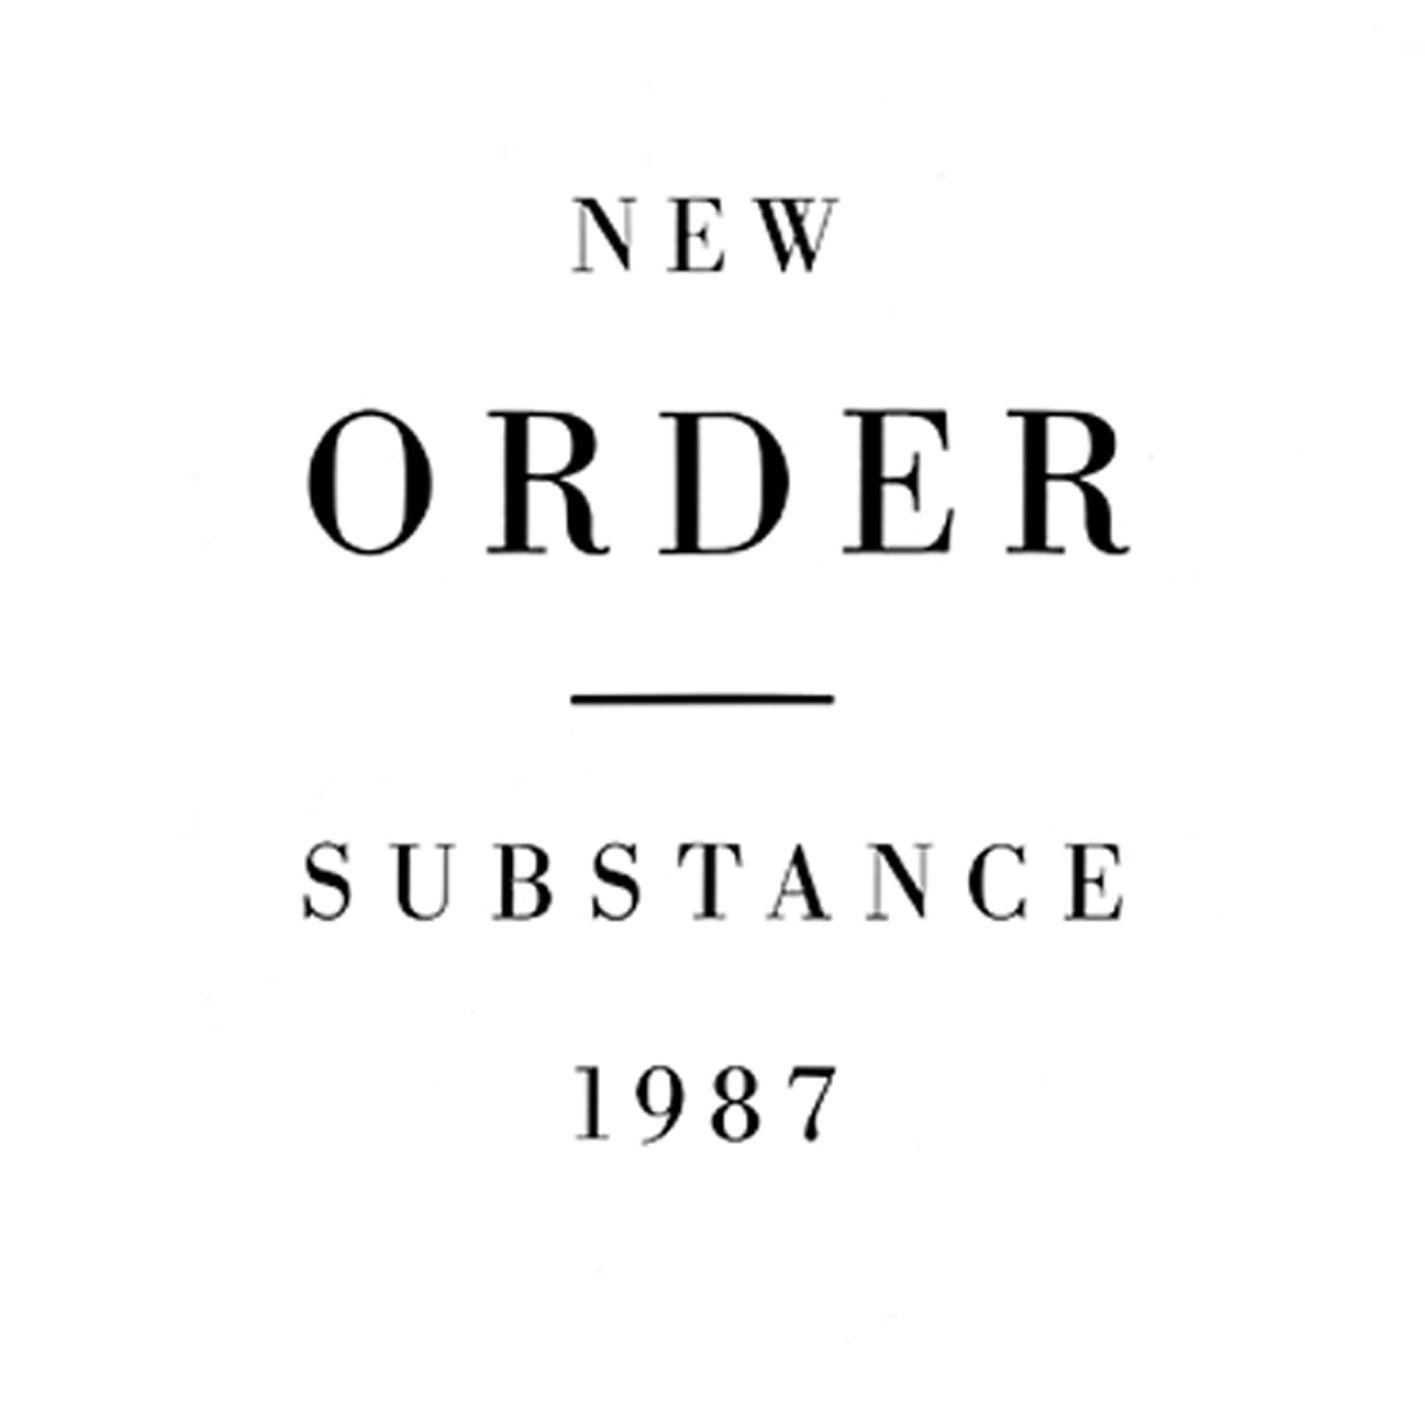 New Order - Substance